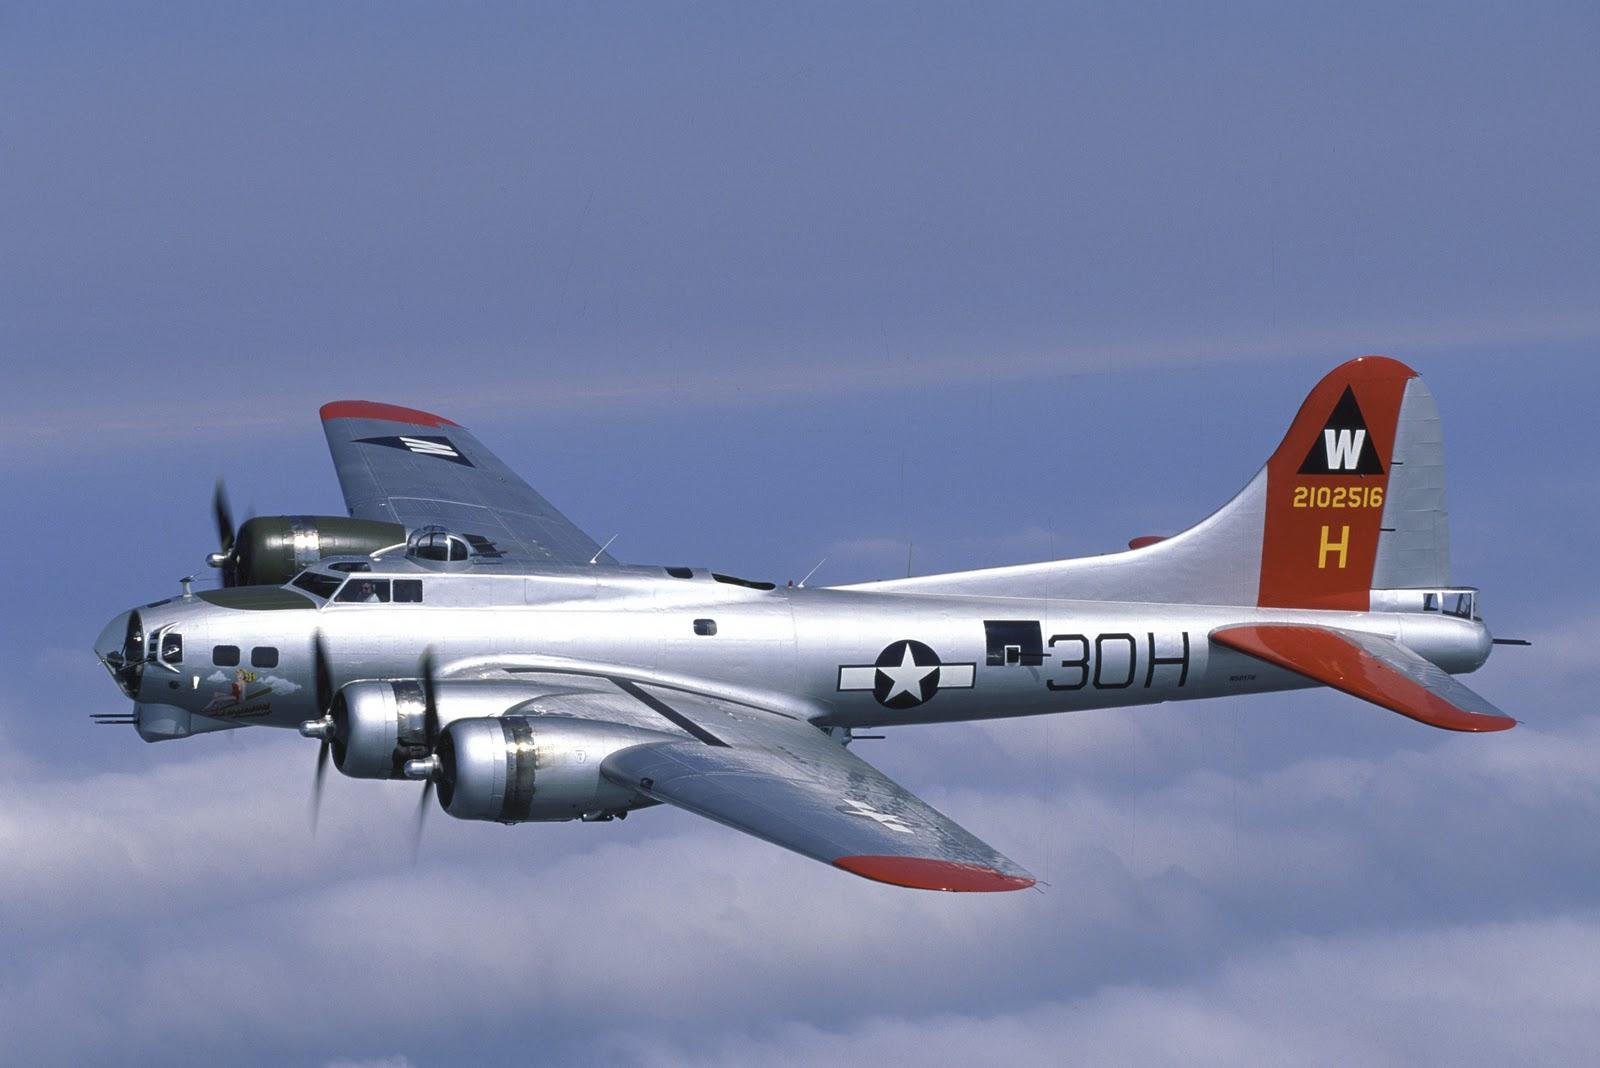 'Heavy Bombers' Return to Wisconsin